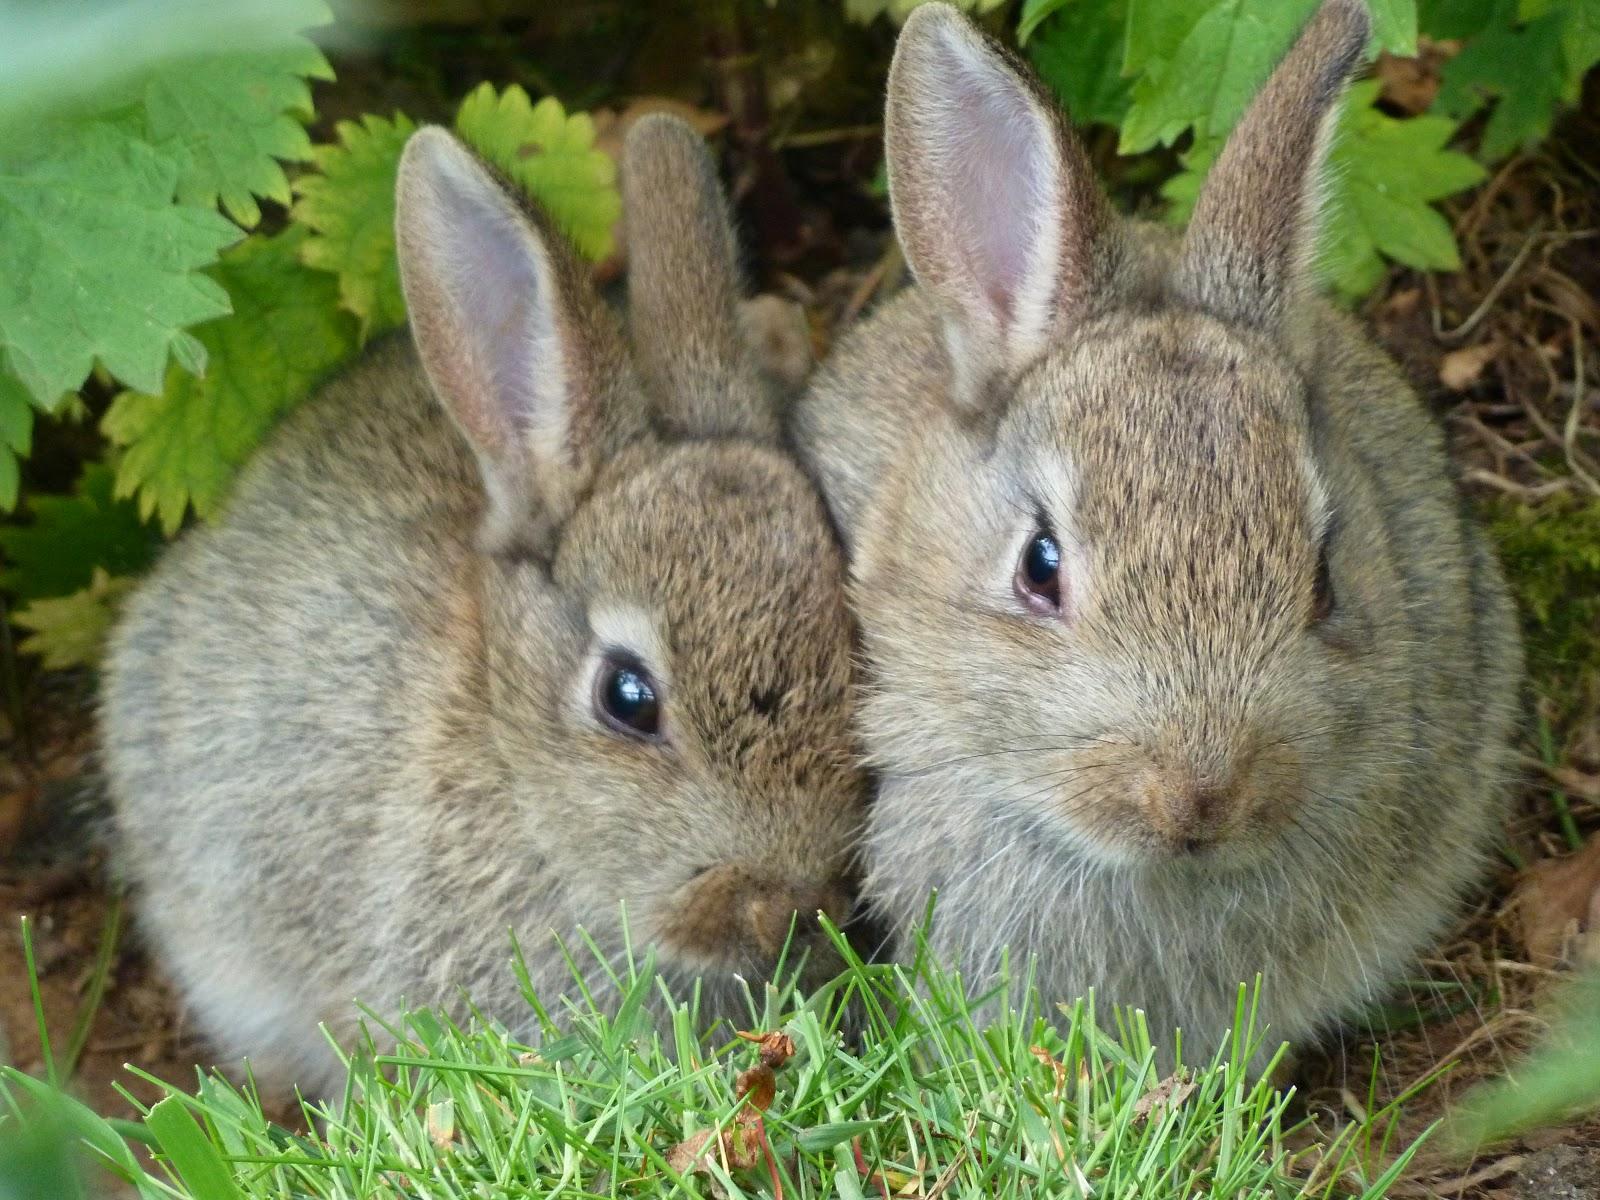 Wild Backyard Rabbits : Wild Baby Rabbits Image courtesy of davesgarden